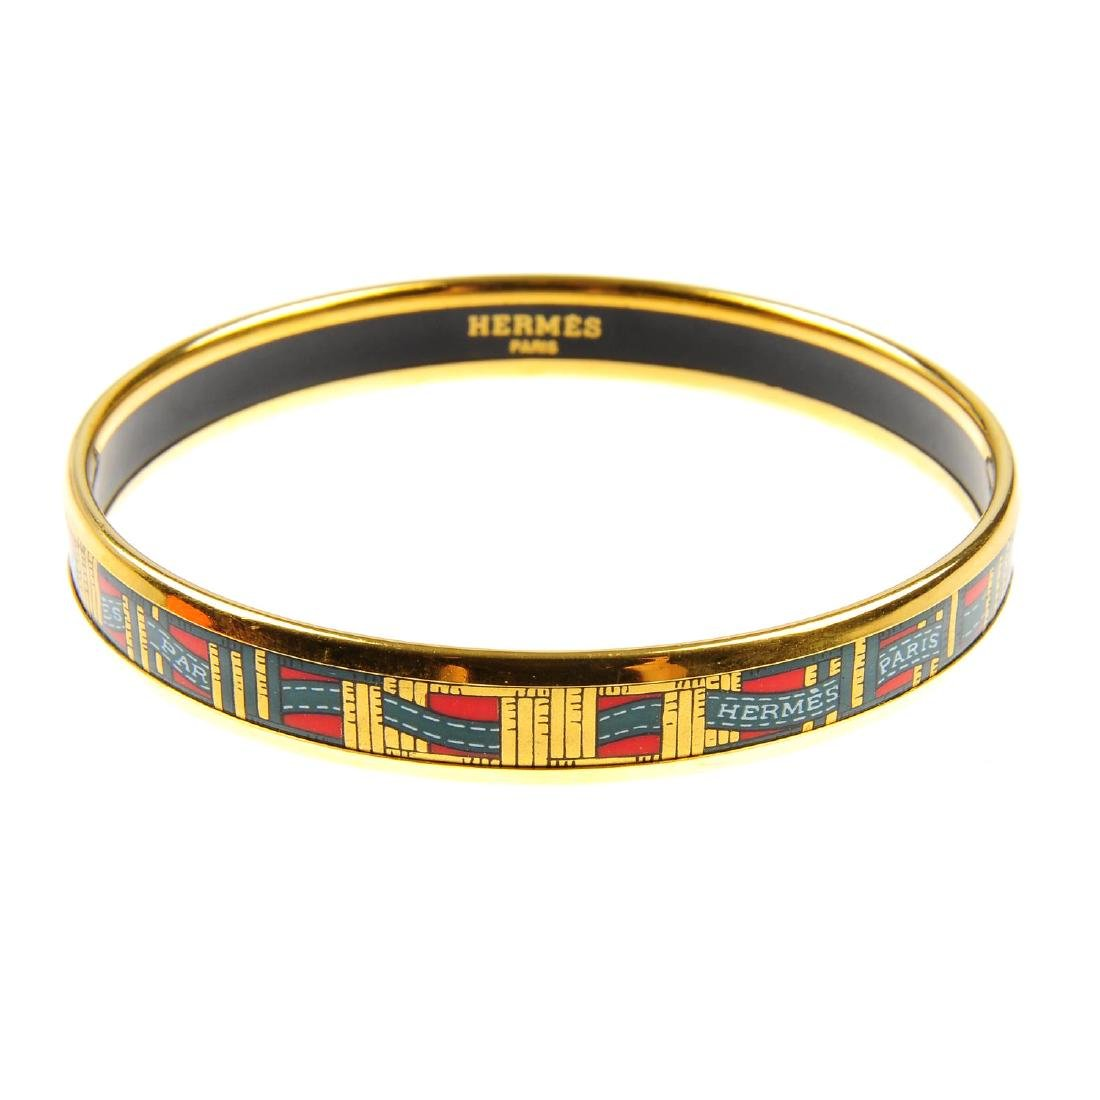 HERMÈS - an enamel bangle. Designed with the maker's